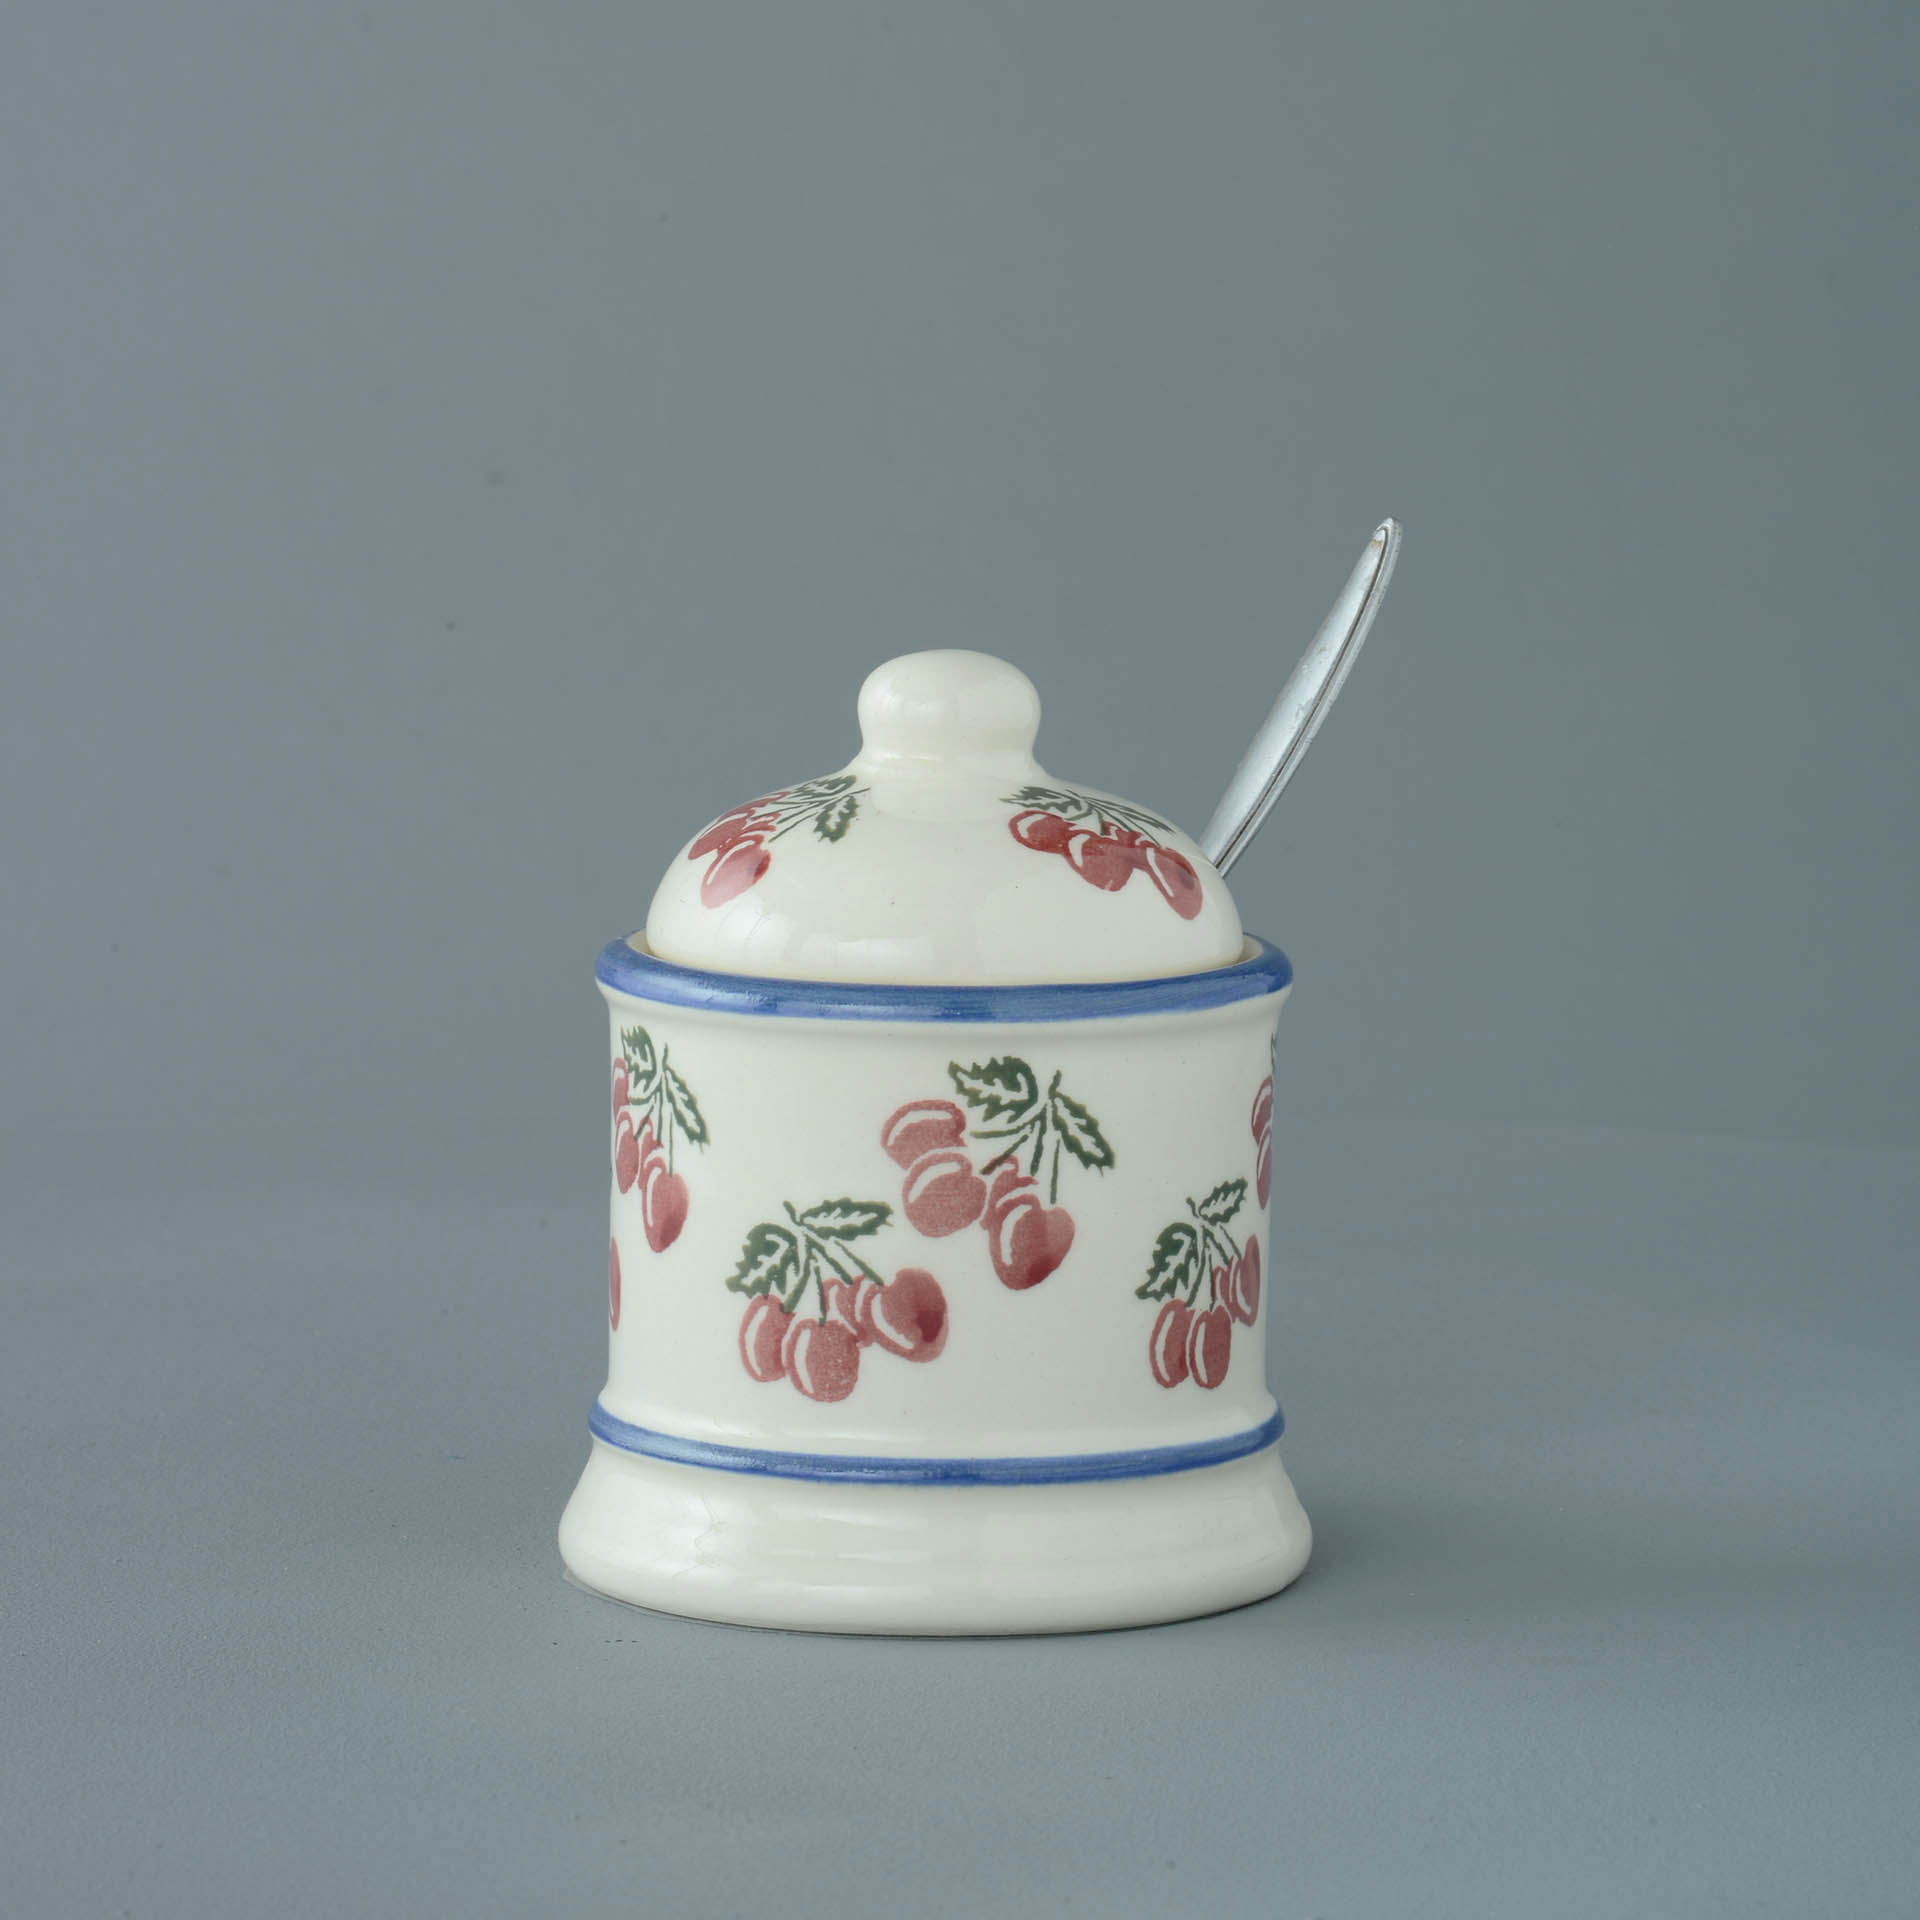 Cherries Jam Pot 10 x 7.5cm